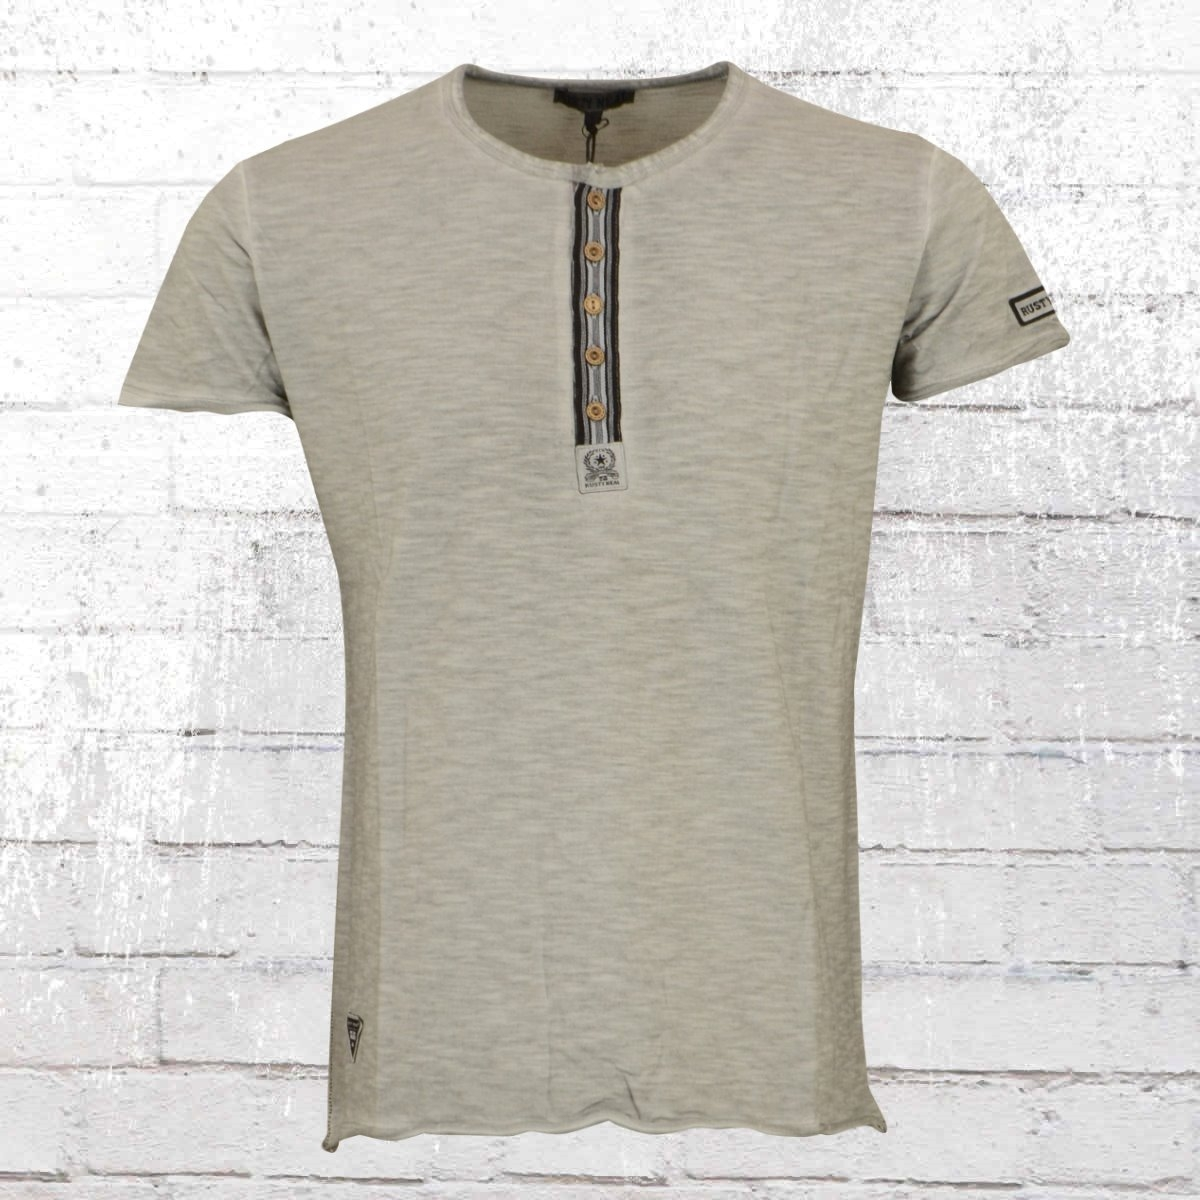 Rusty Neal Vintage T-Shirt Mit Knopfleiste grau